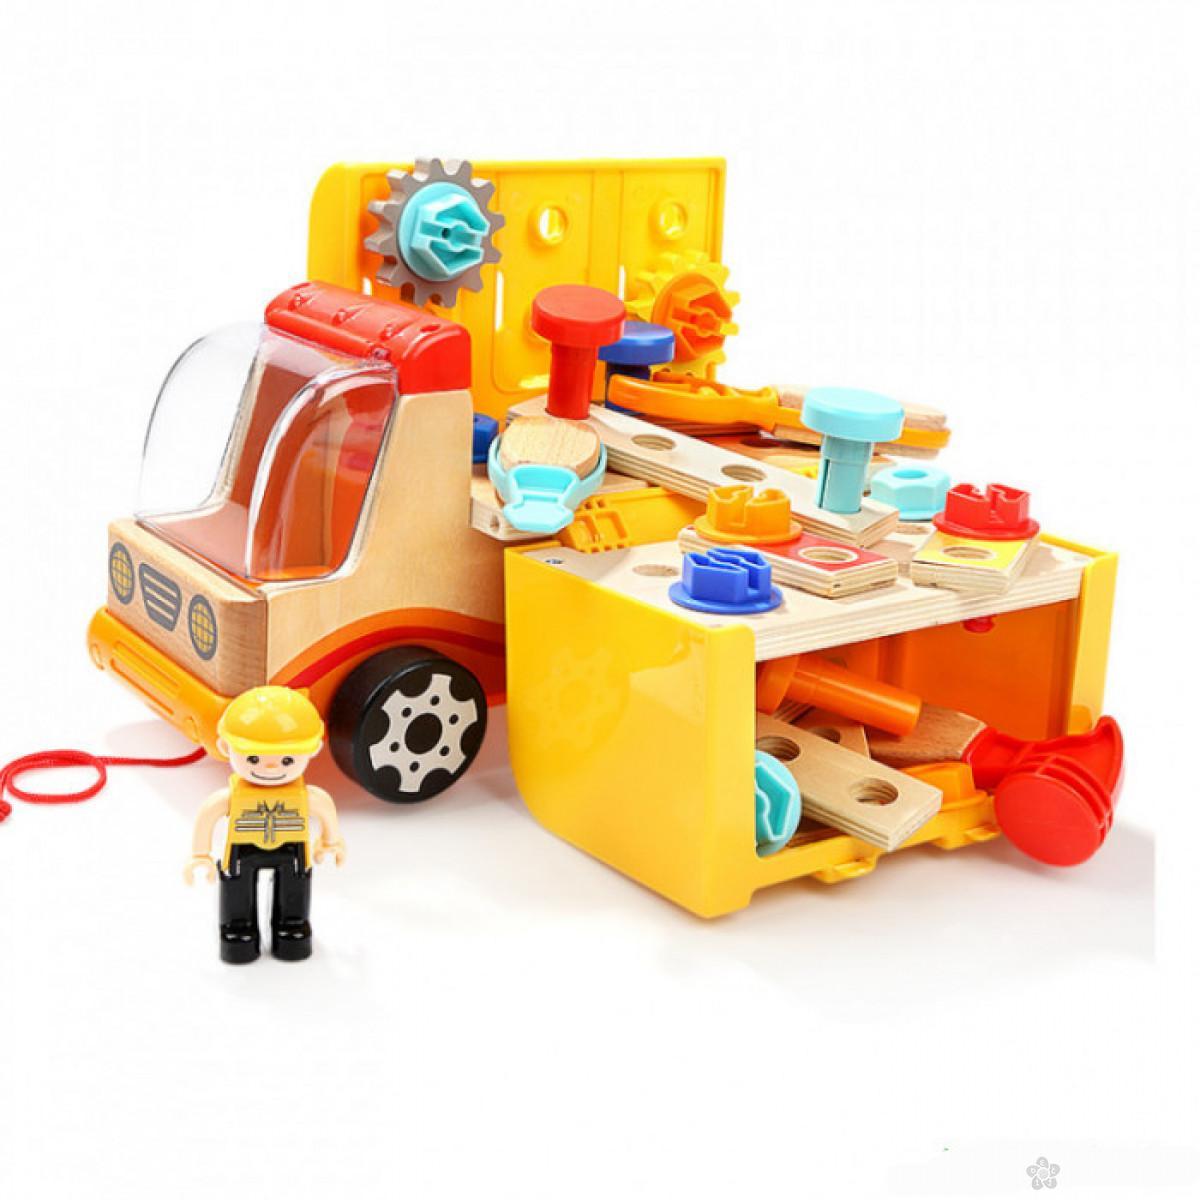 Didaktička igračka Kamion radionica ToP Bright 120312